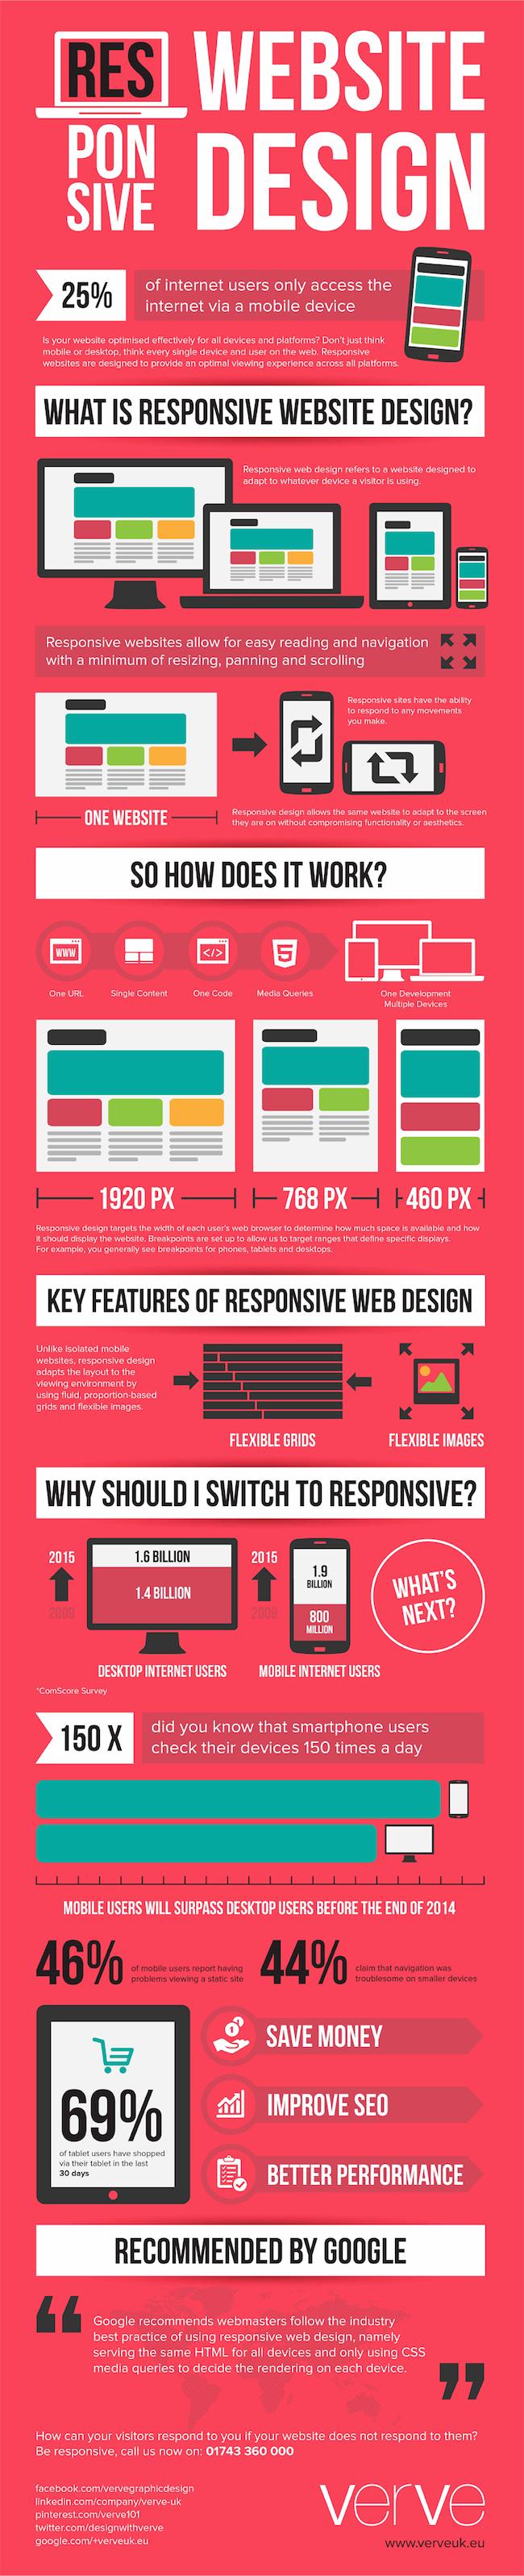 Infographic - Τι είναι το Responsive Web Design